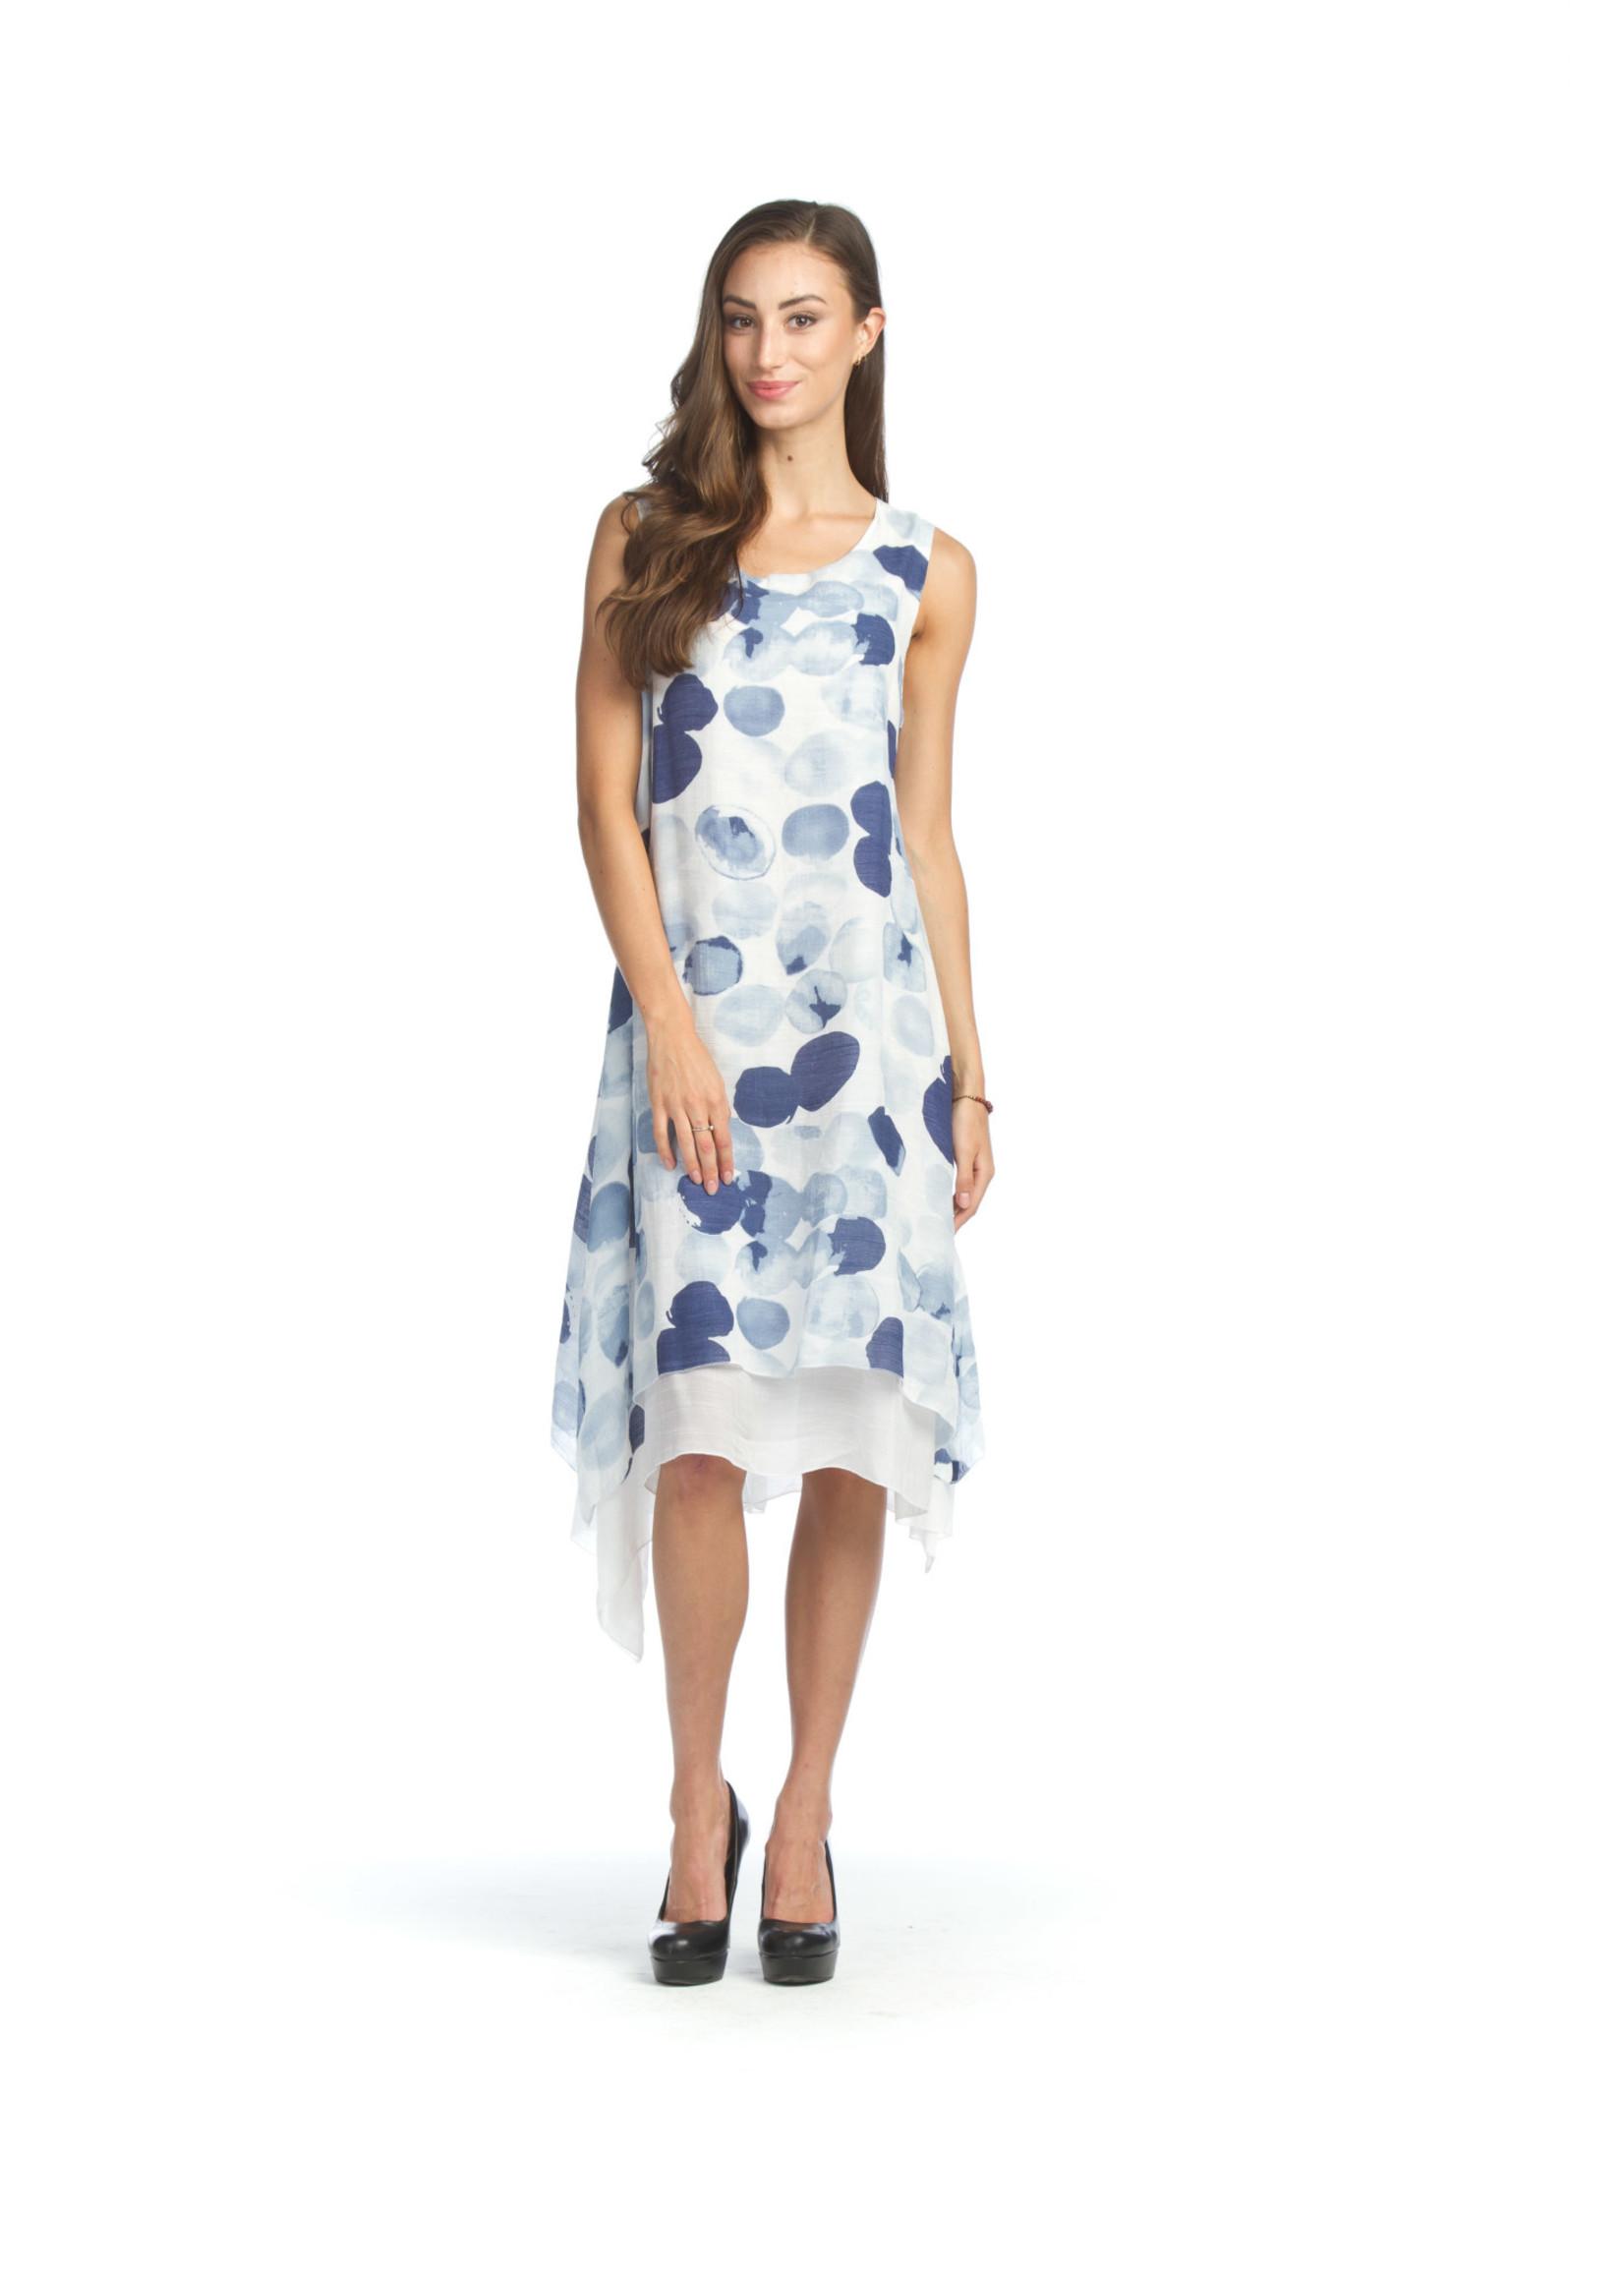 Papillon Polka Dot Layered Crinkle Dress